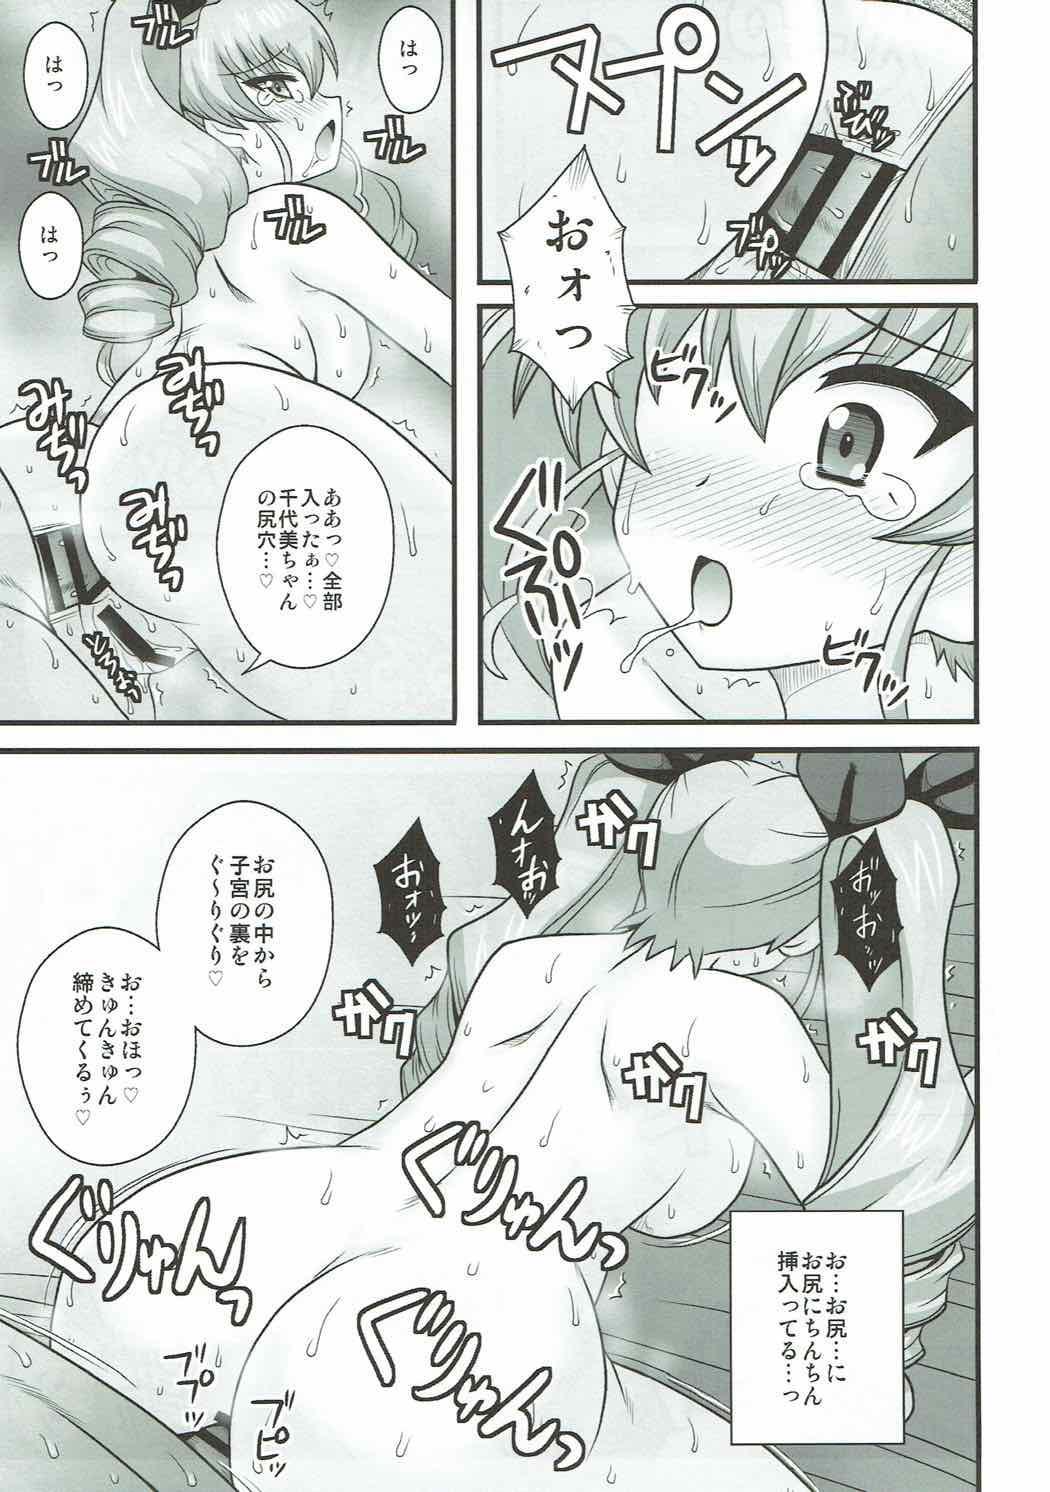 Anzio Enkou Chiyomi 17-sai 21